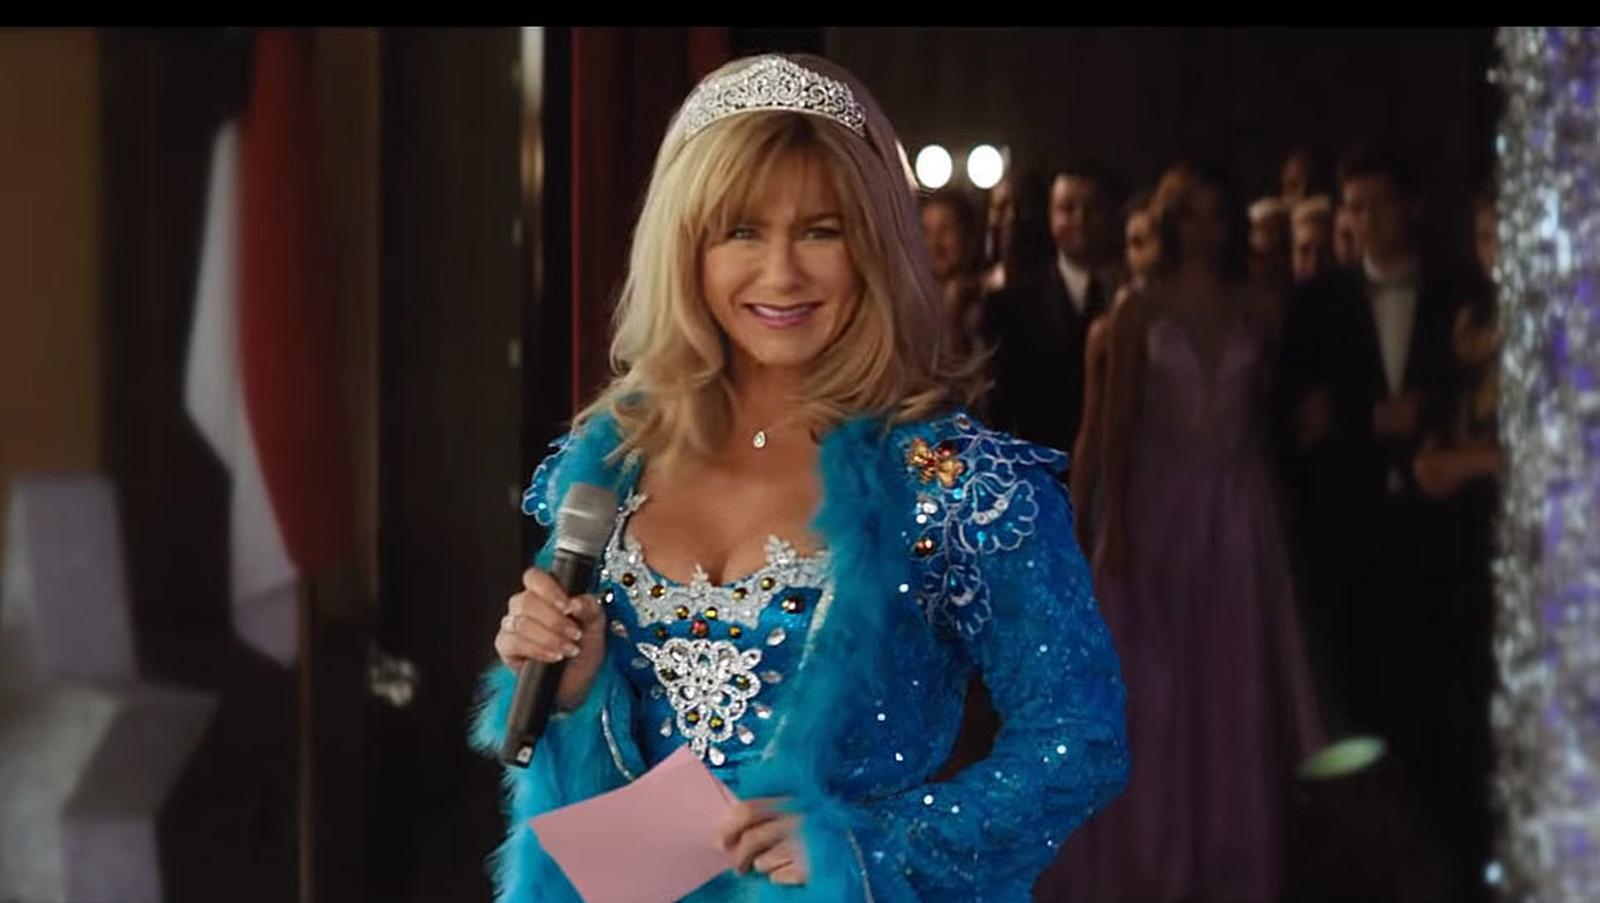 Jennifer Aniston plays Texan pageant queen in Netflix film Dumplin'